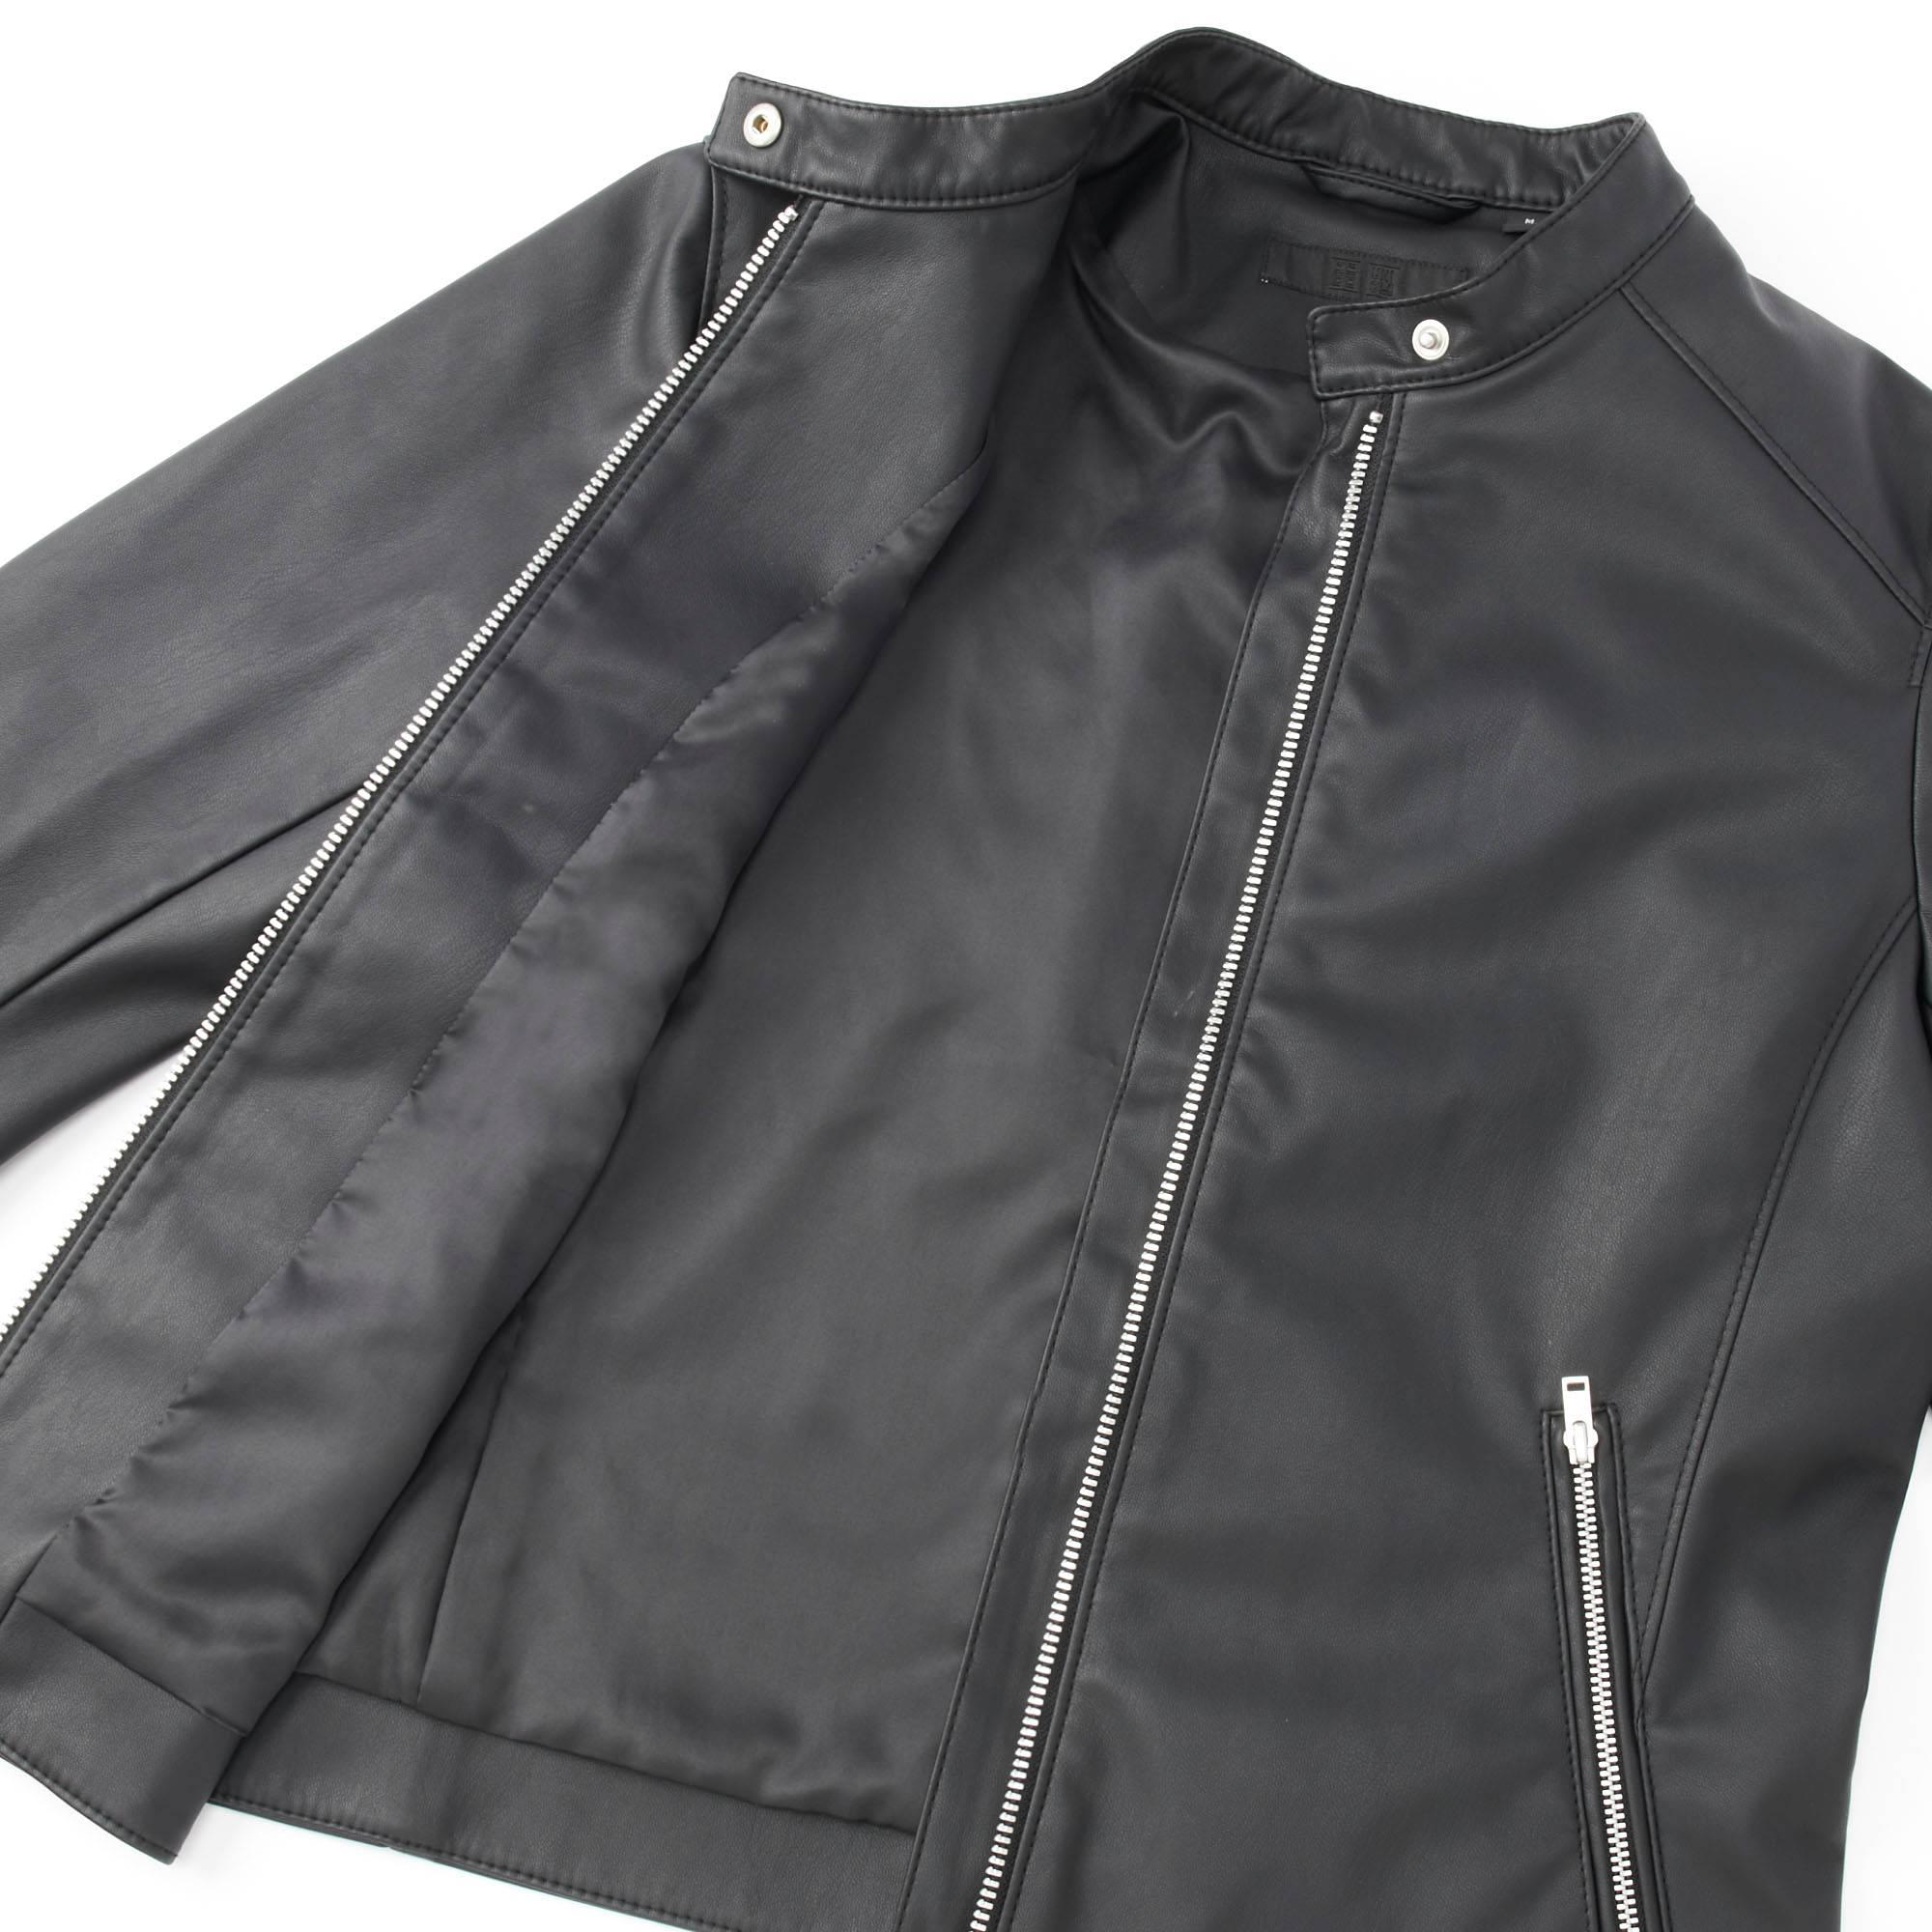 Leather jacket uniqlo - Women Riders Single Jacket Black Small